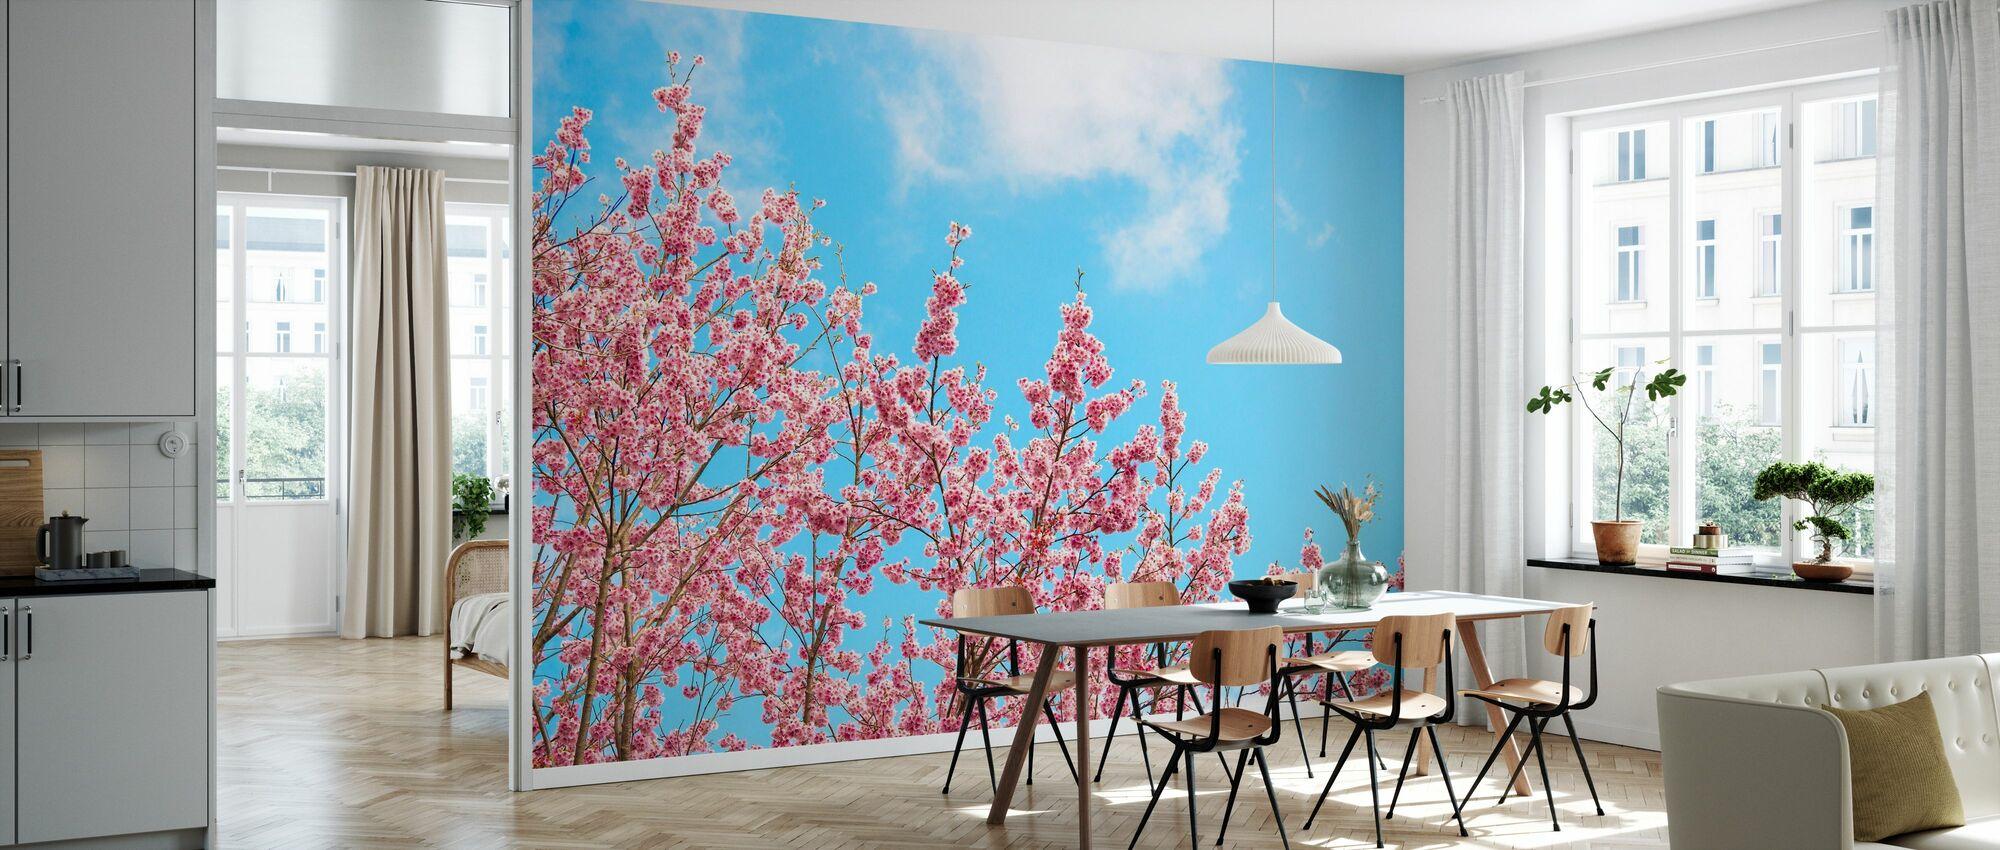 Japan Rising Sun - Cherry Blossoms - Wallpaper - Kitchen